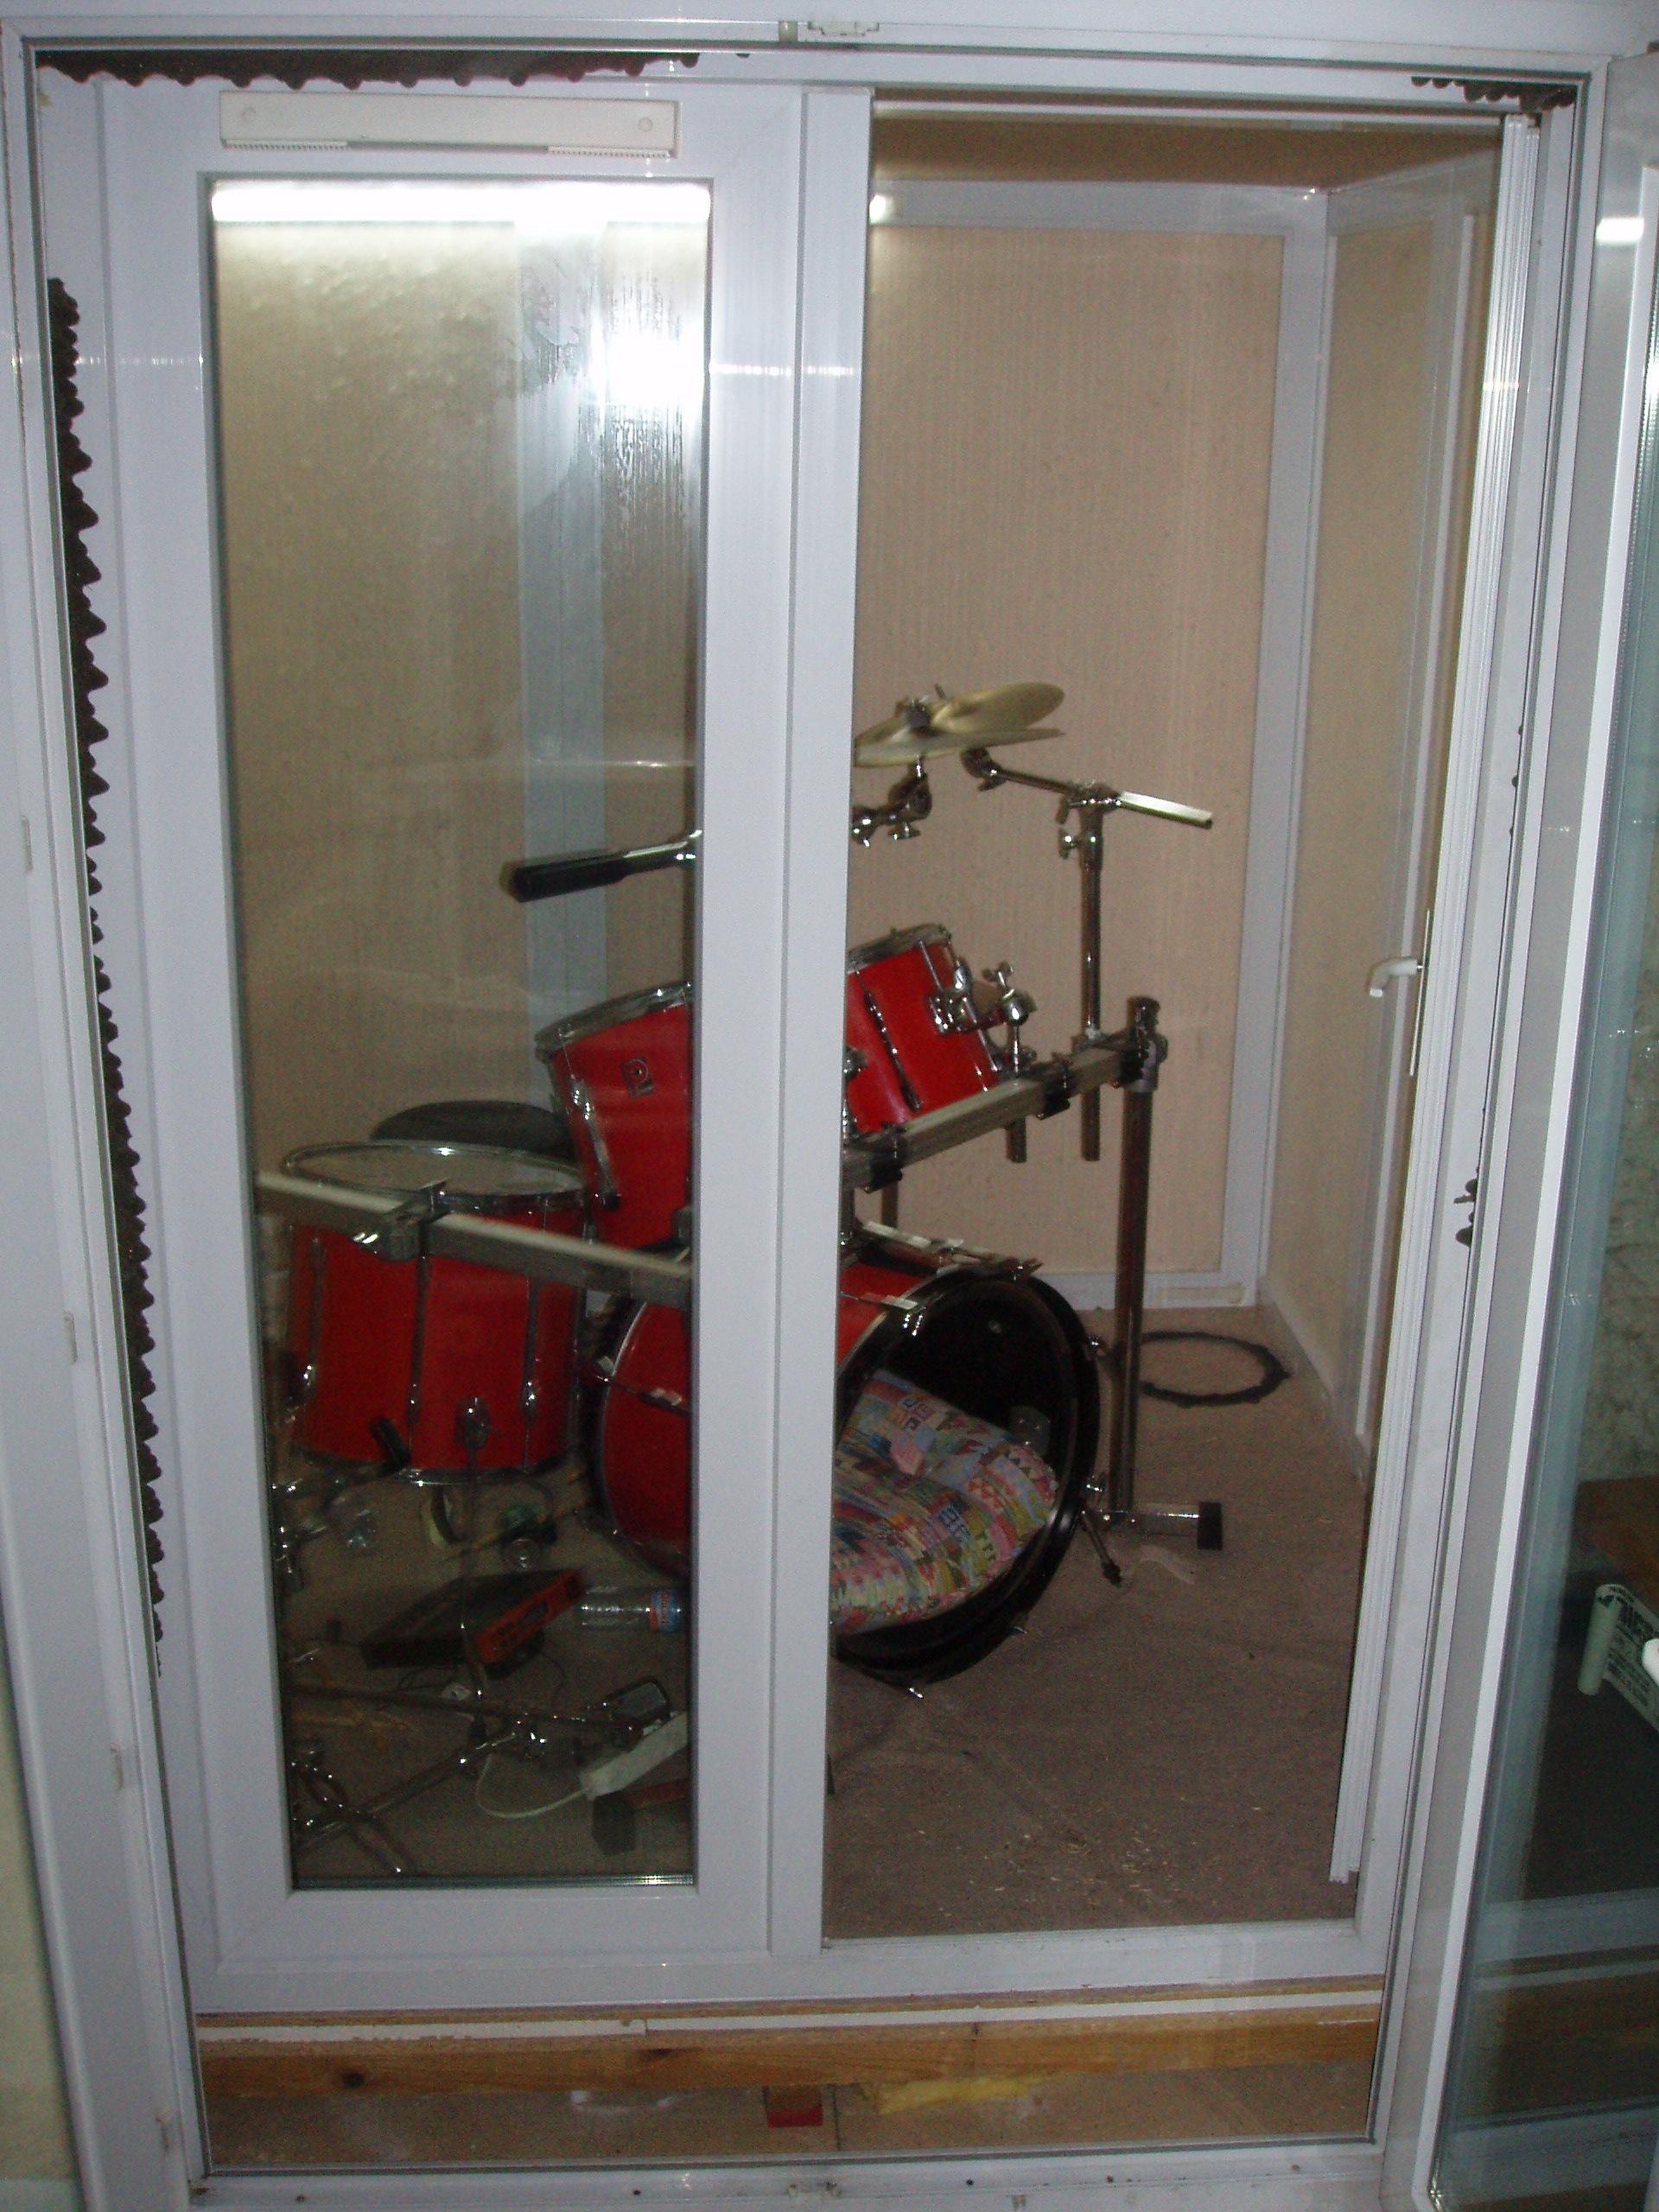 Photo abso cabine acoustique abso cabine insonoris e 8166 8166 audiofanzine - Produits autorises en cabine ...